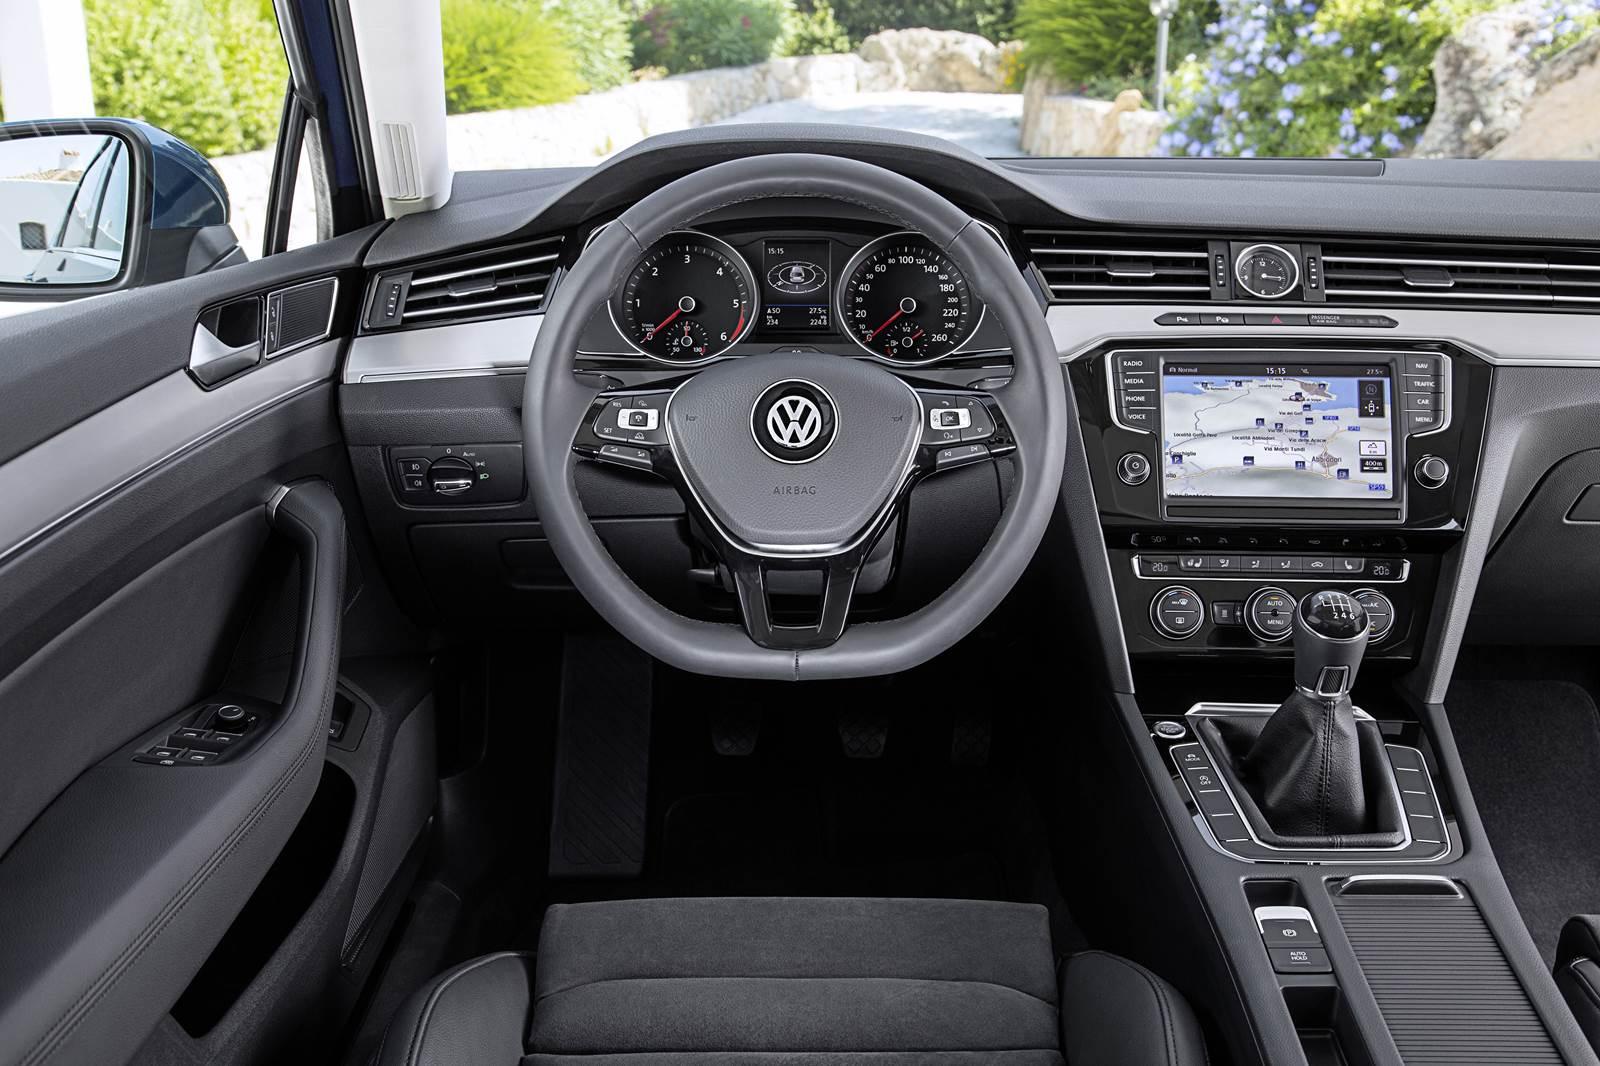 Novo passat chega ao brasil no segundo semestre de 2015 for Volkswagen passat interior